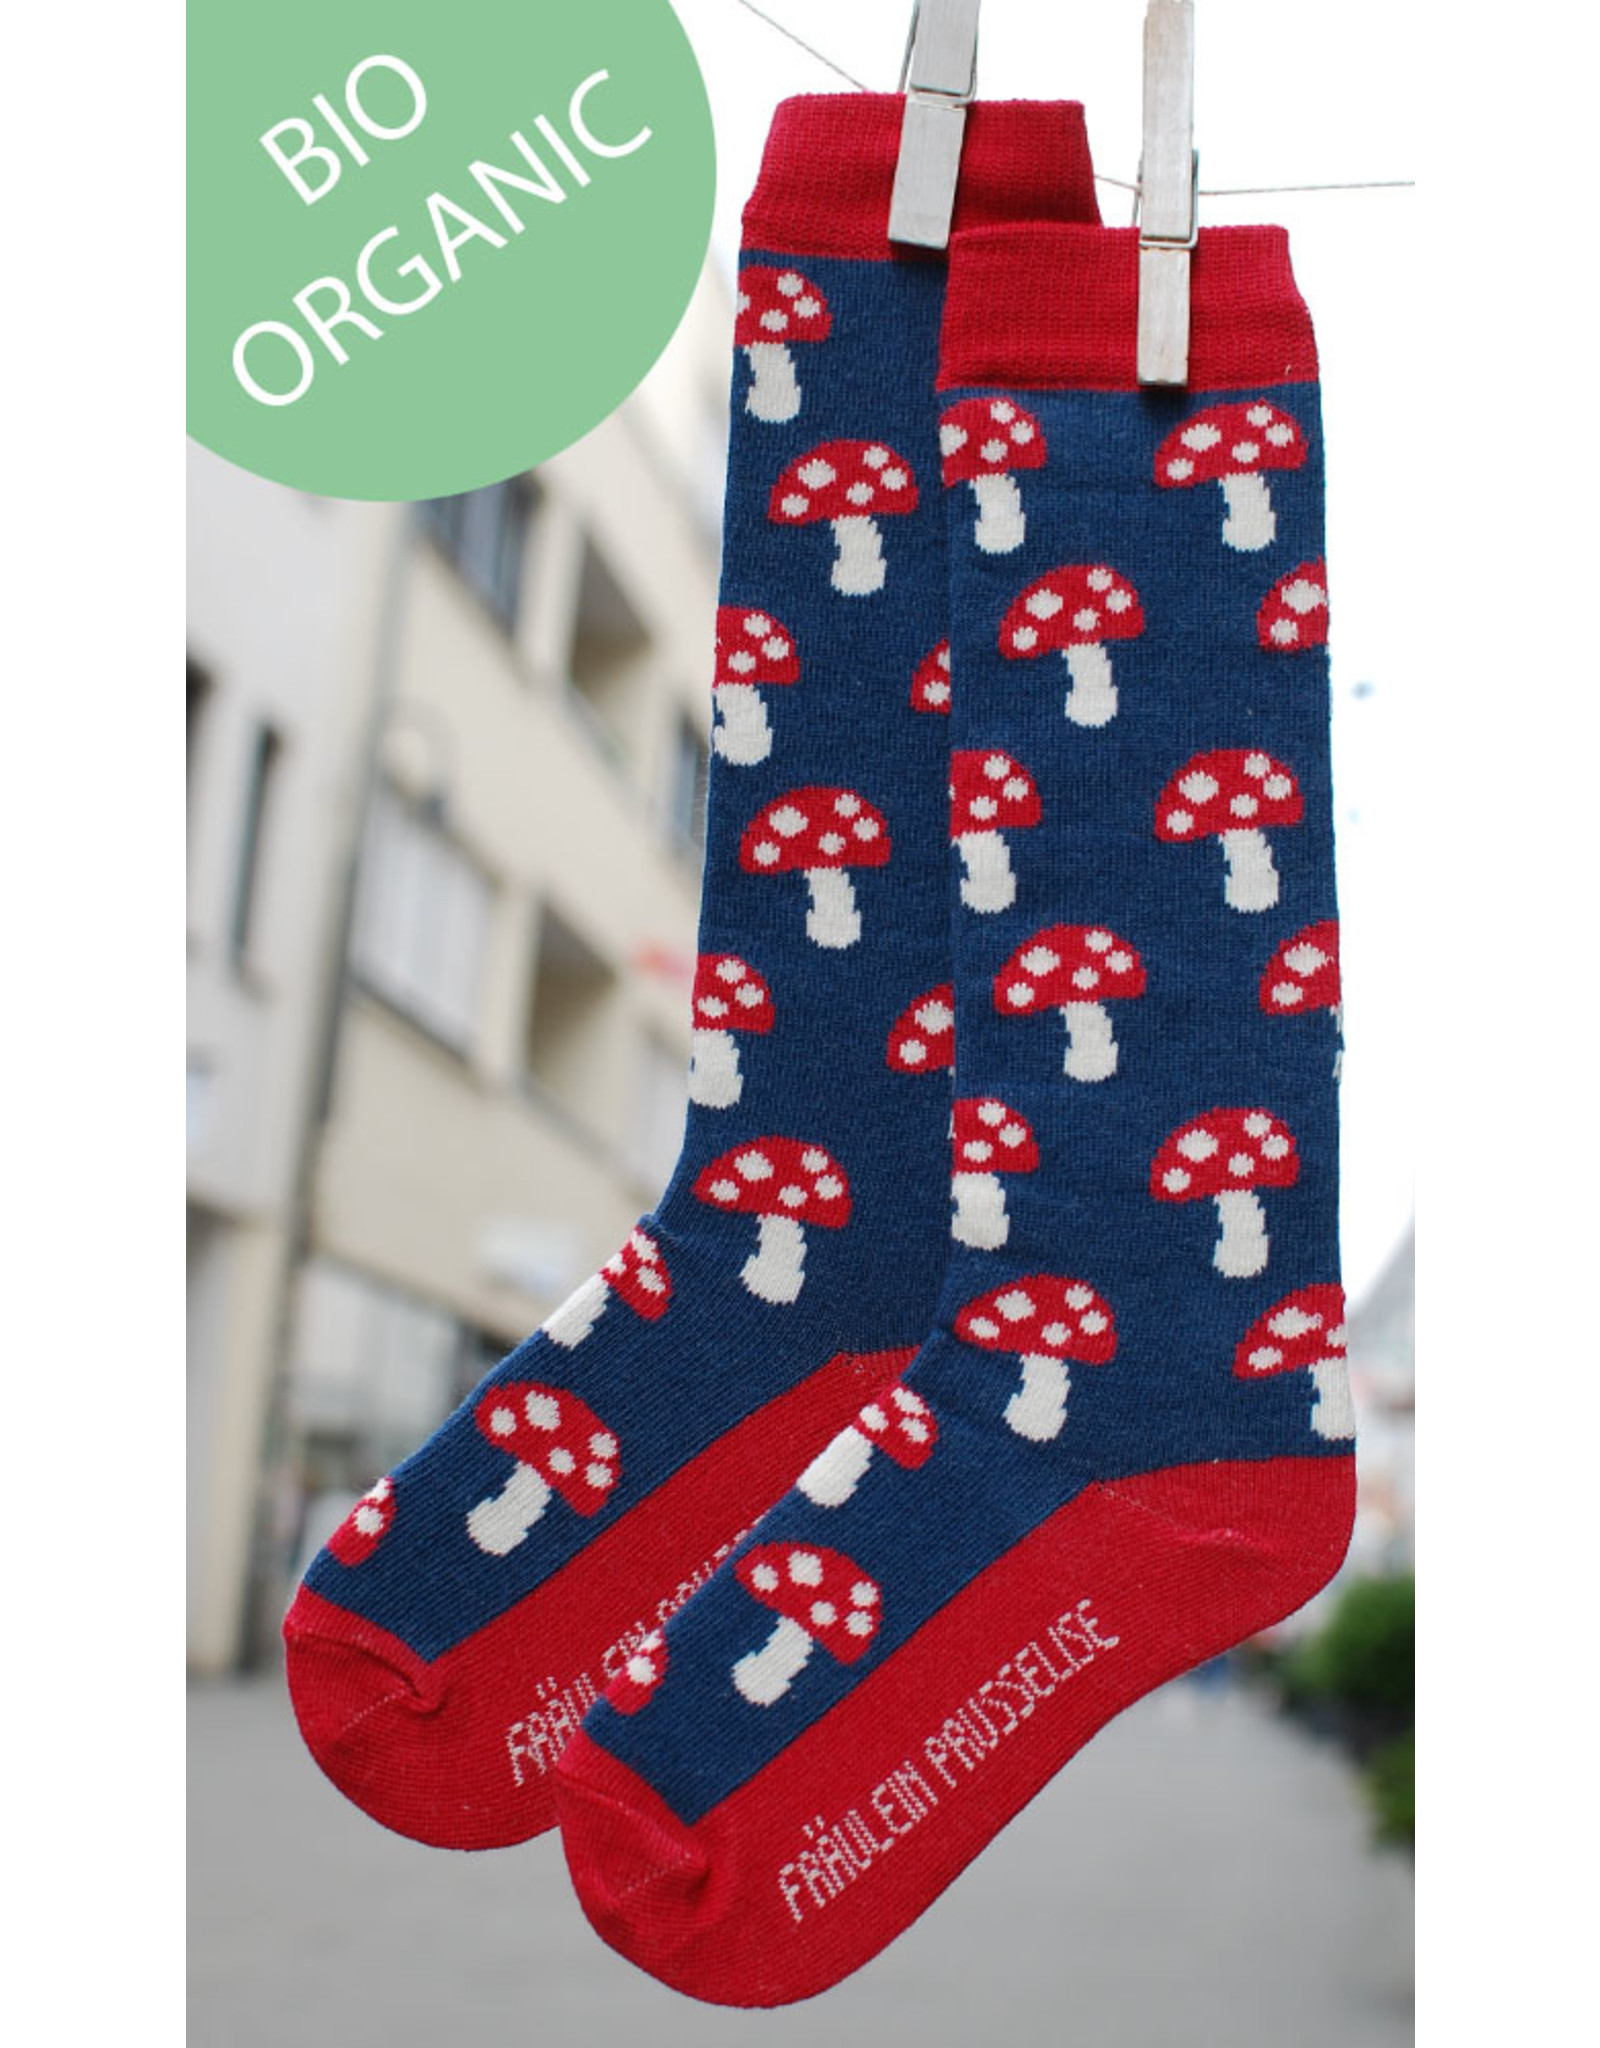 Fräulein Prusselise Children's knee socks - mushrooms